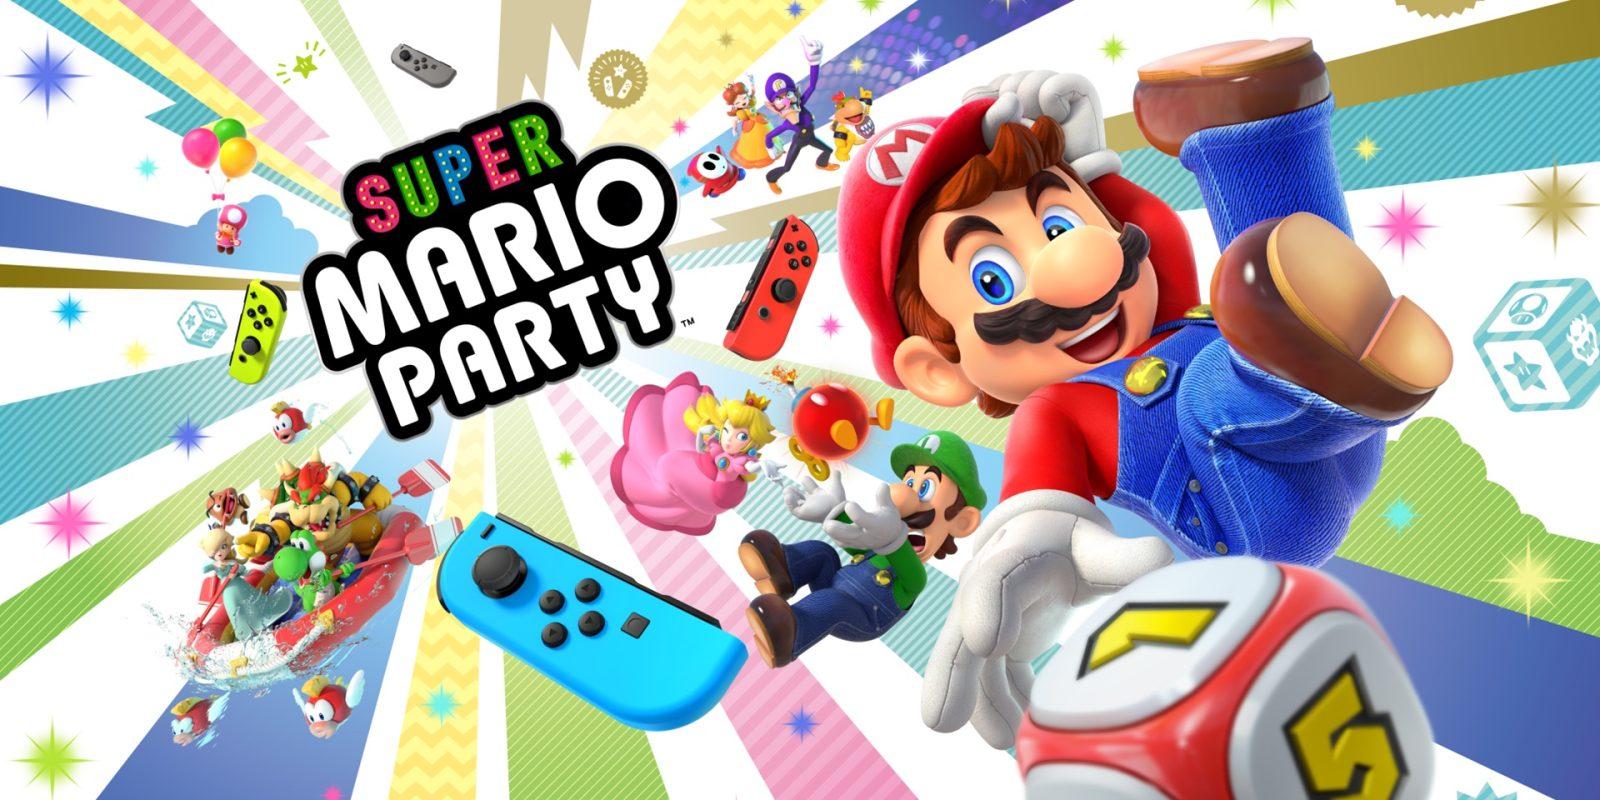 Today's Best Game Deals: Super Mario Party $40, Stardew